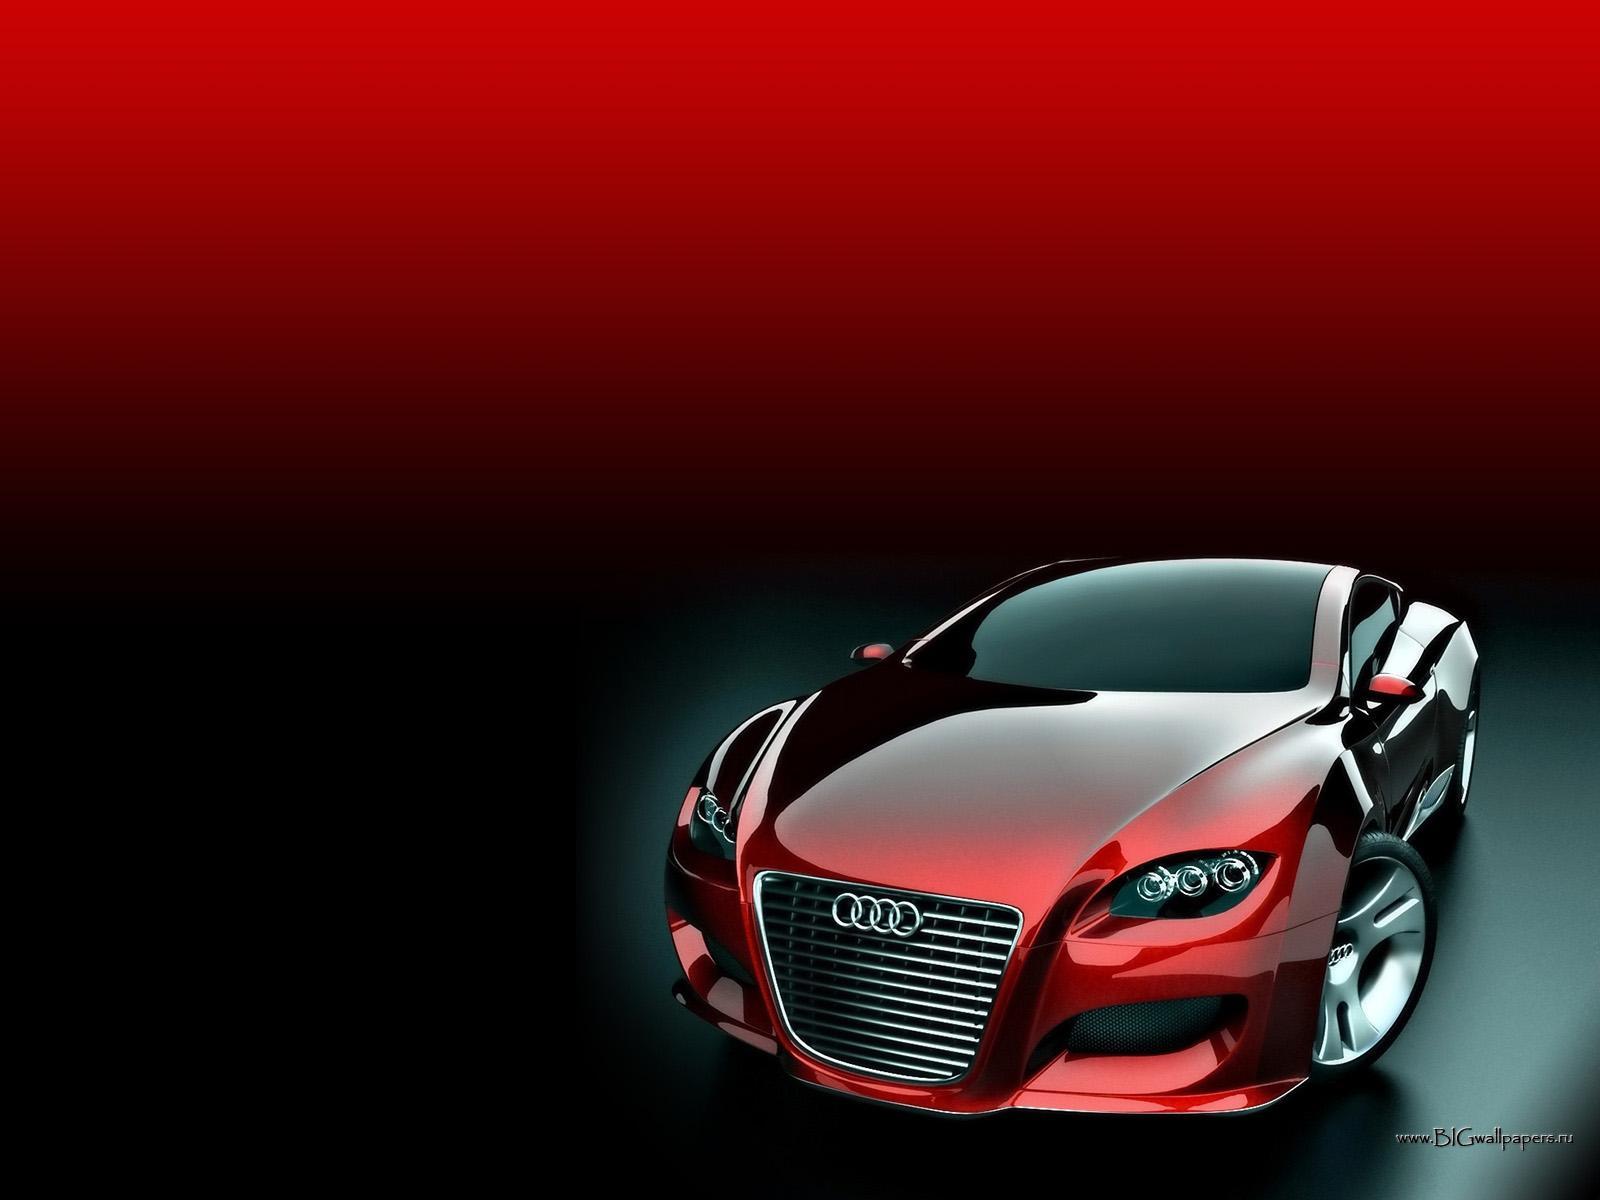 Car Background Audi HD wallpaper background 1600x1200